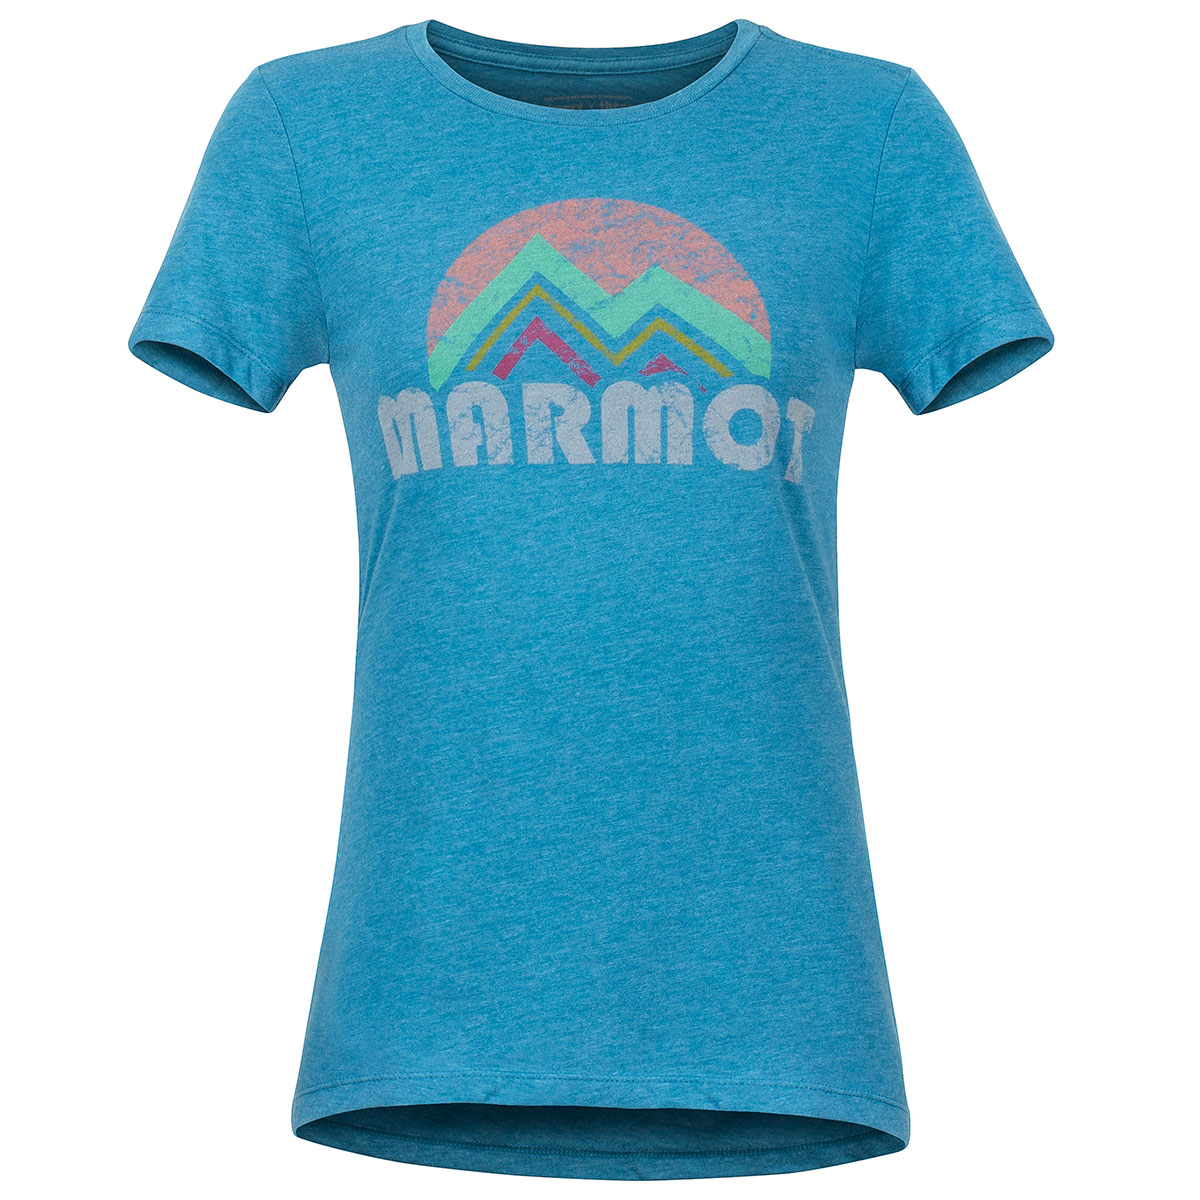 Marmot Women's Reyes Short-Sleeve Tee - Blue, L